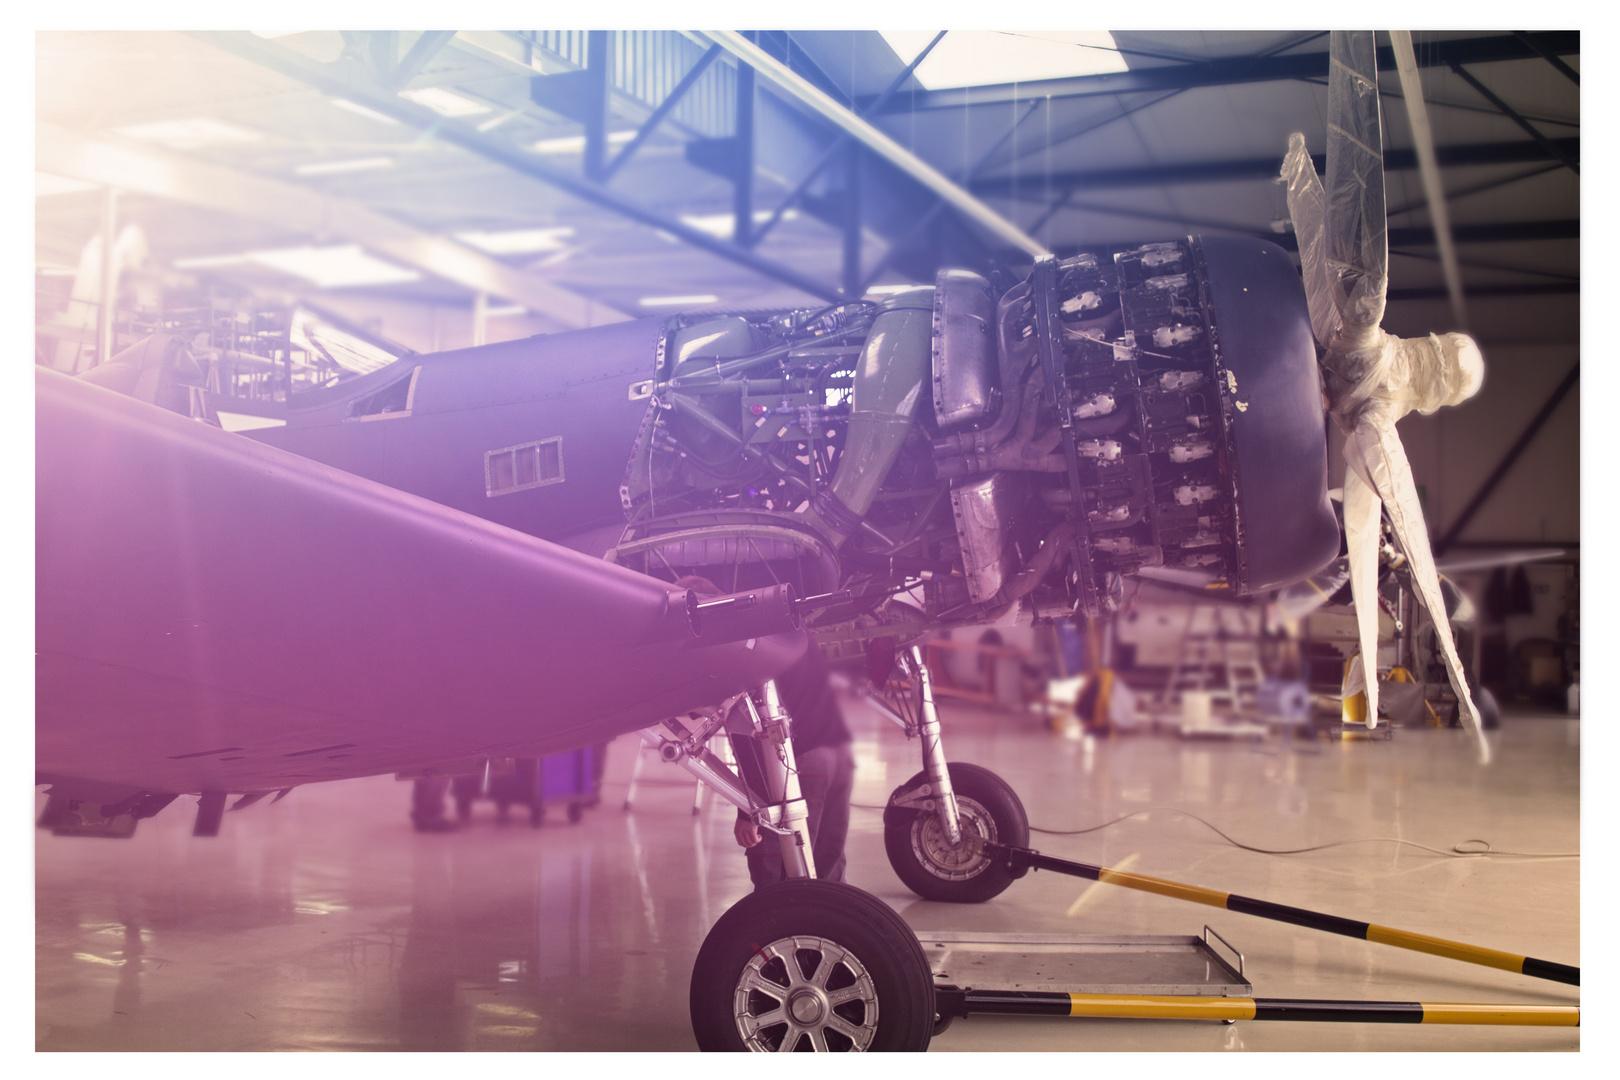 Corsair im Hangar